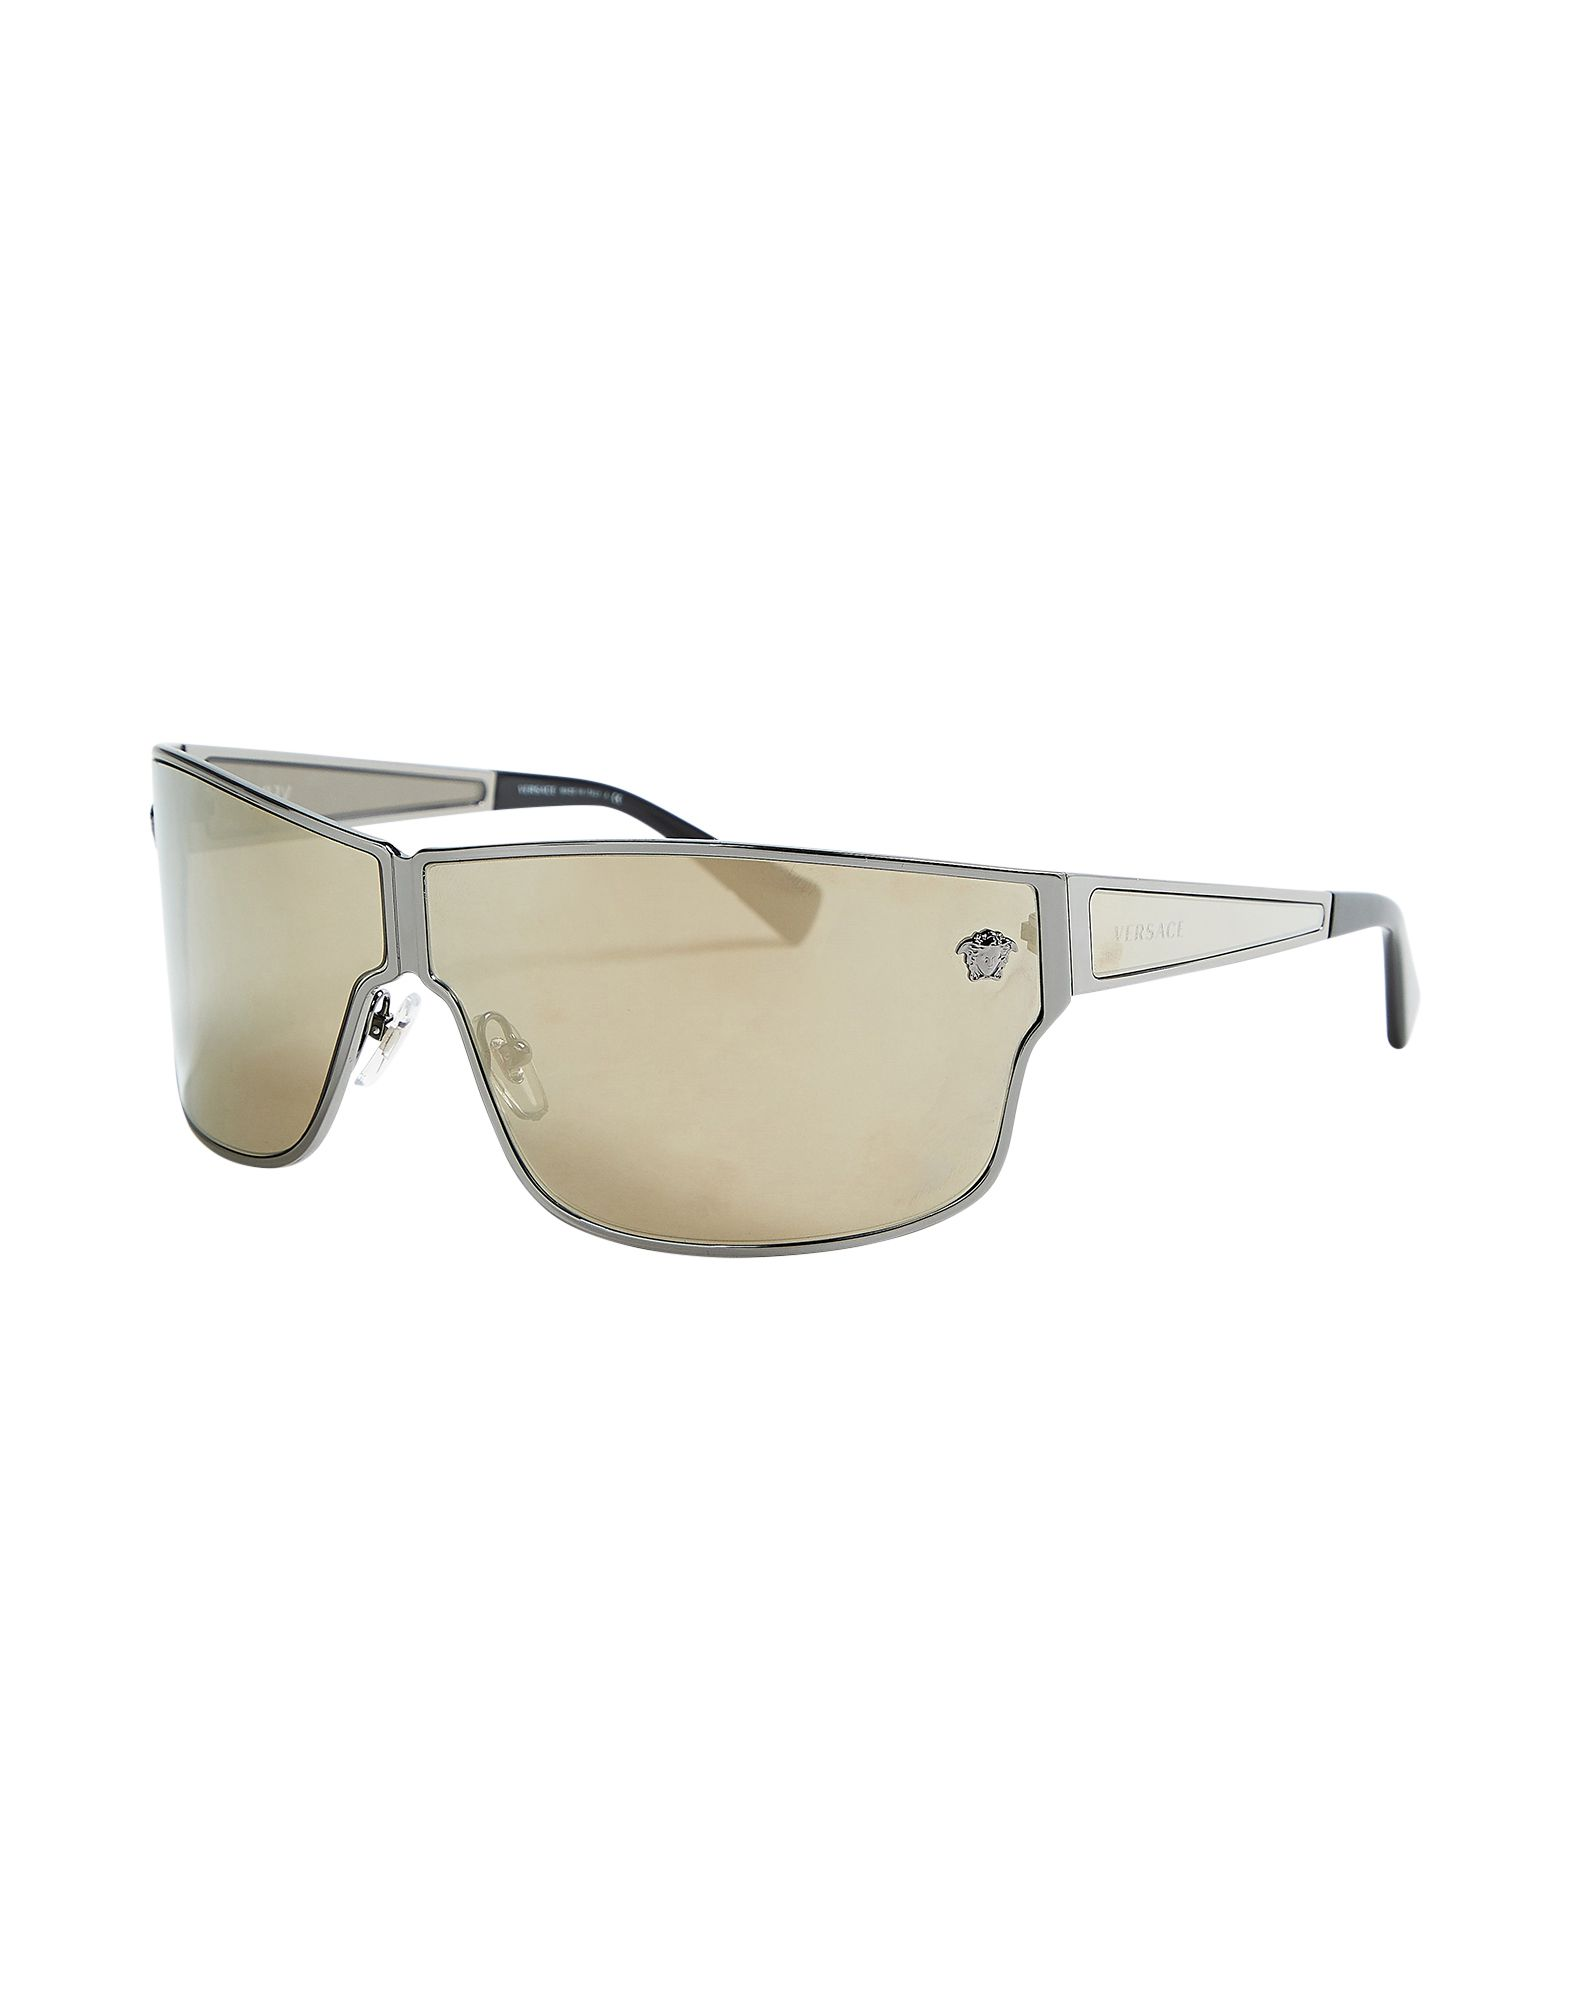 14ac7b4f8 Buy sunglasses & eyewear for men - Best men's sunglasses & eyewear shop -  Cools.com